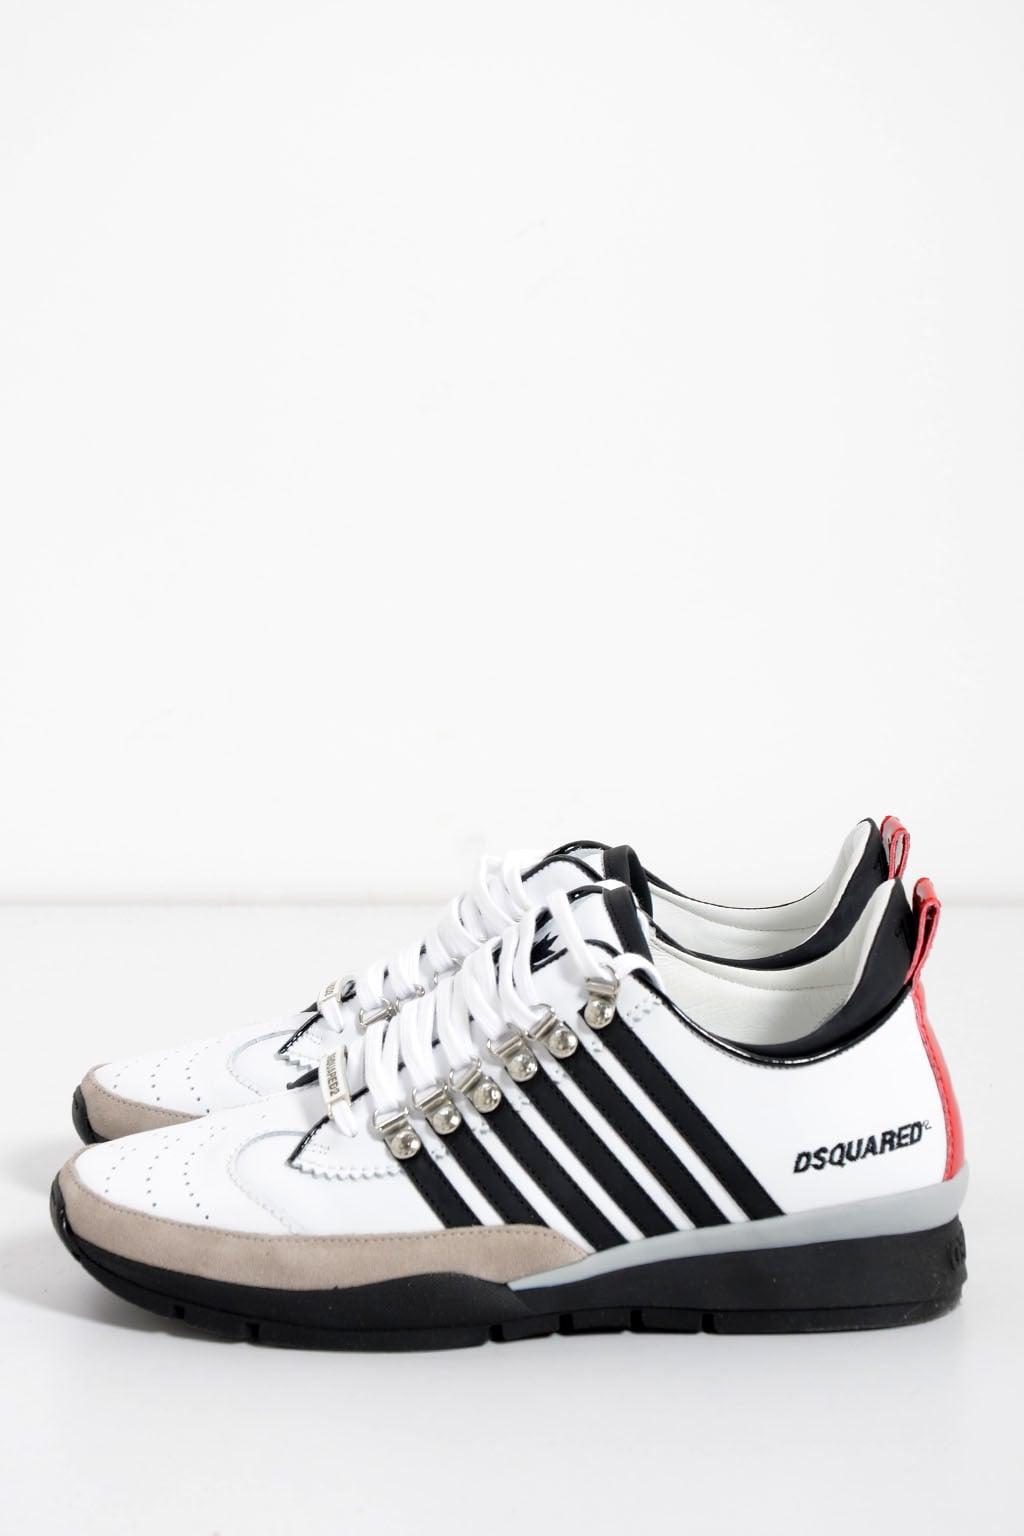 Wit Online Koop Lace Dsquared Bij Sneaker Up Low Je qfIq0w1